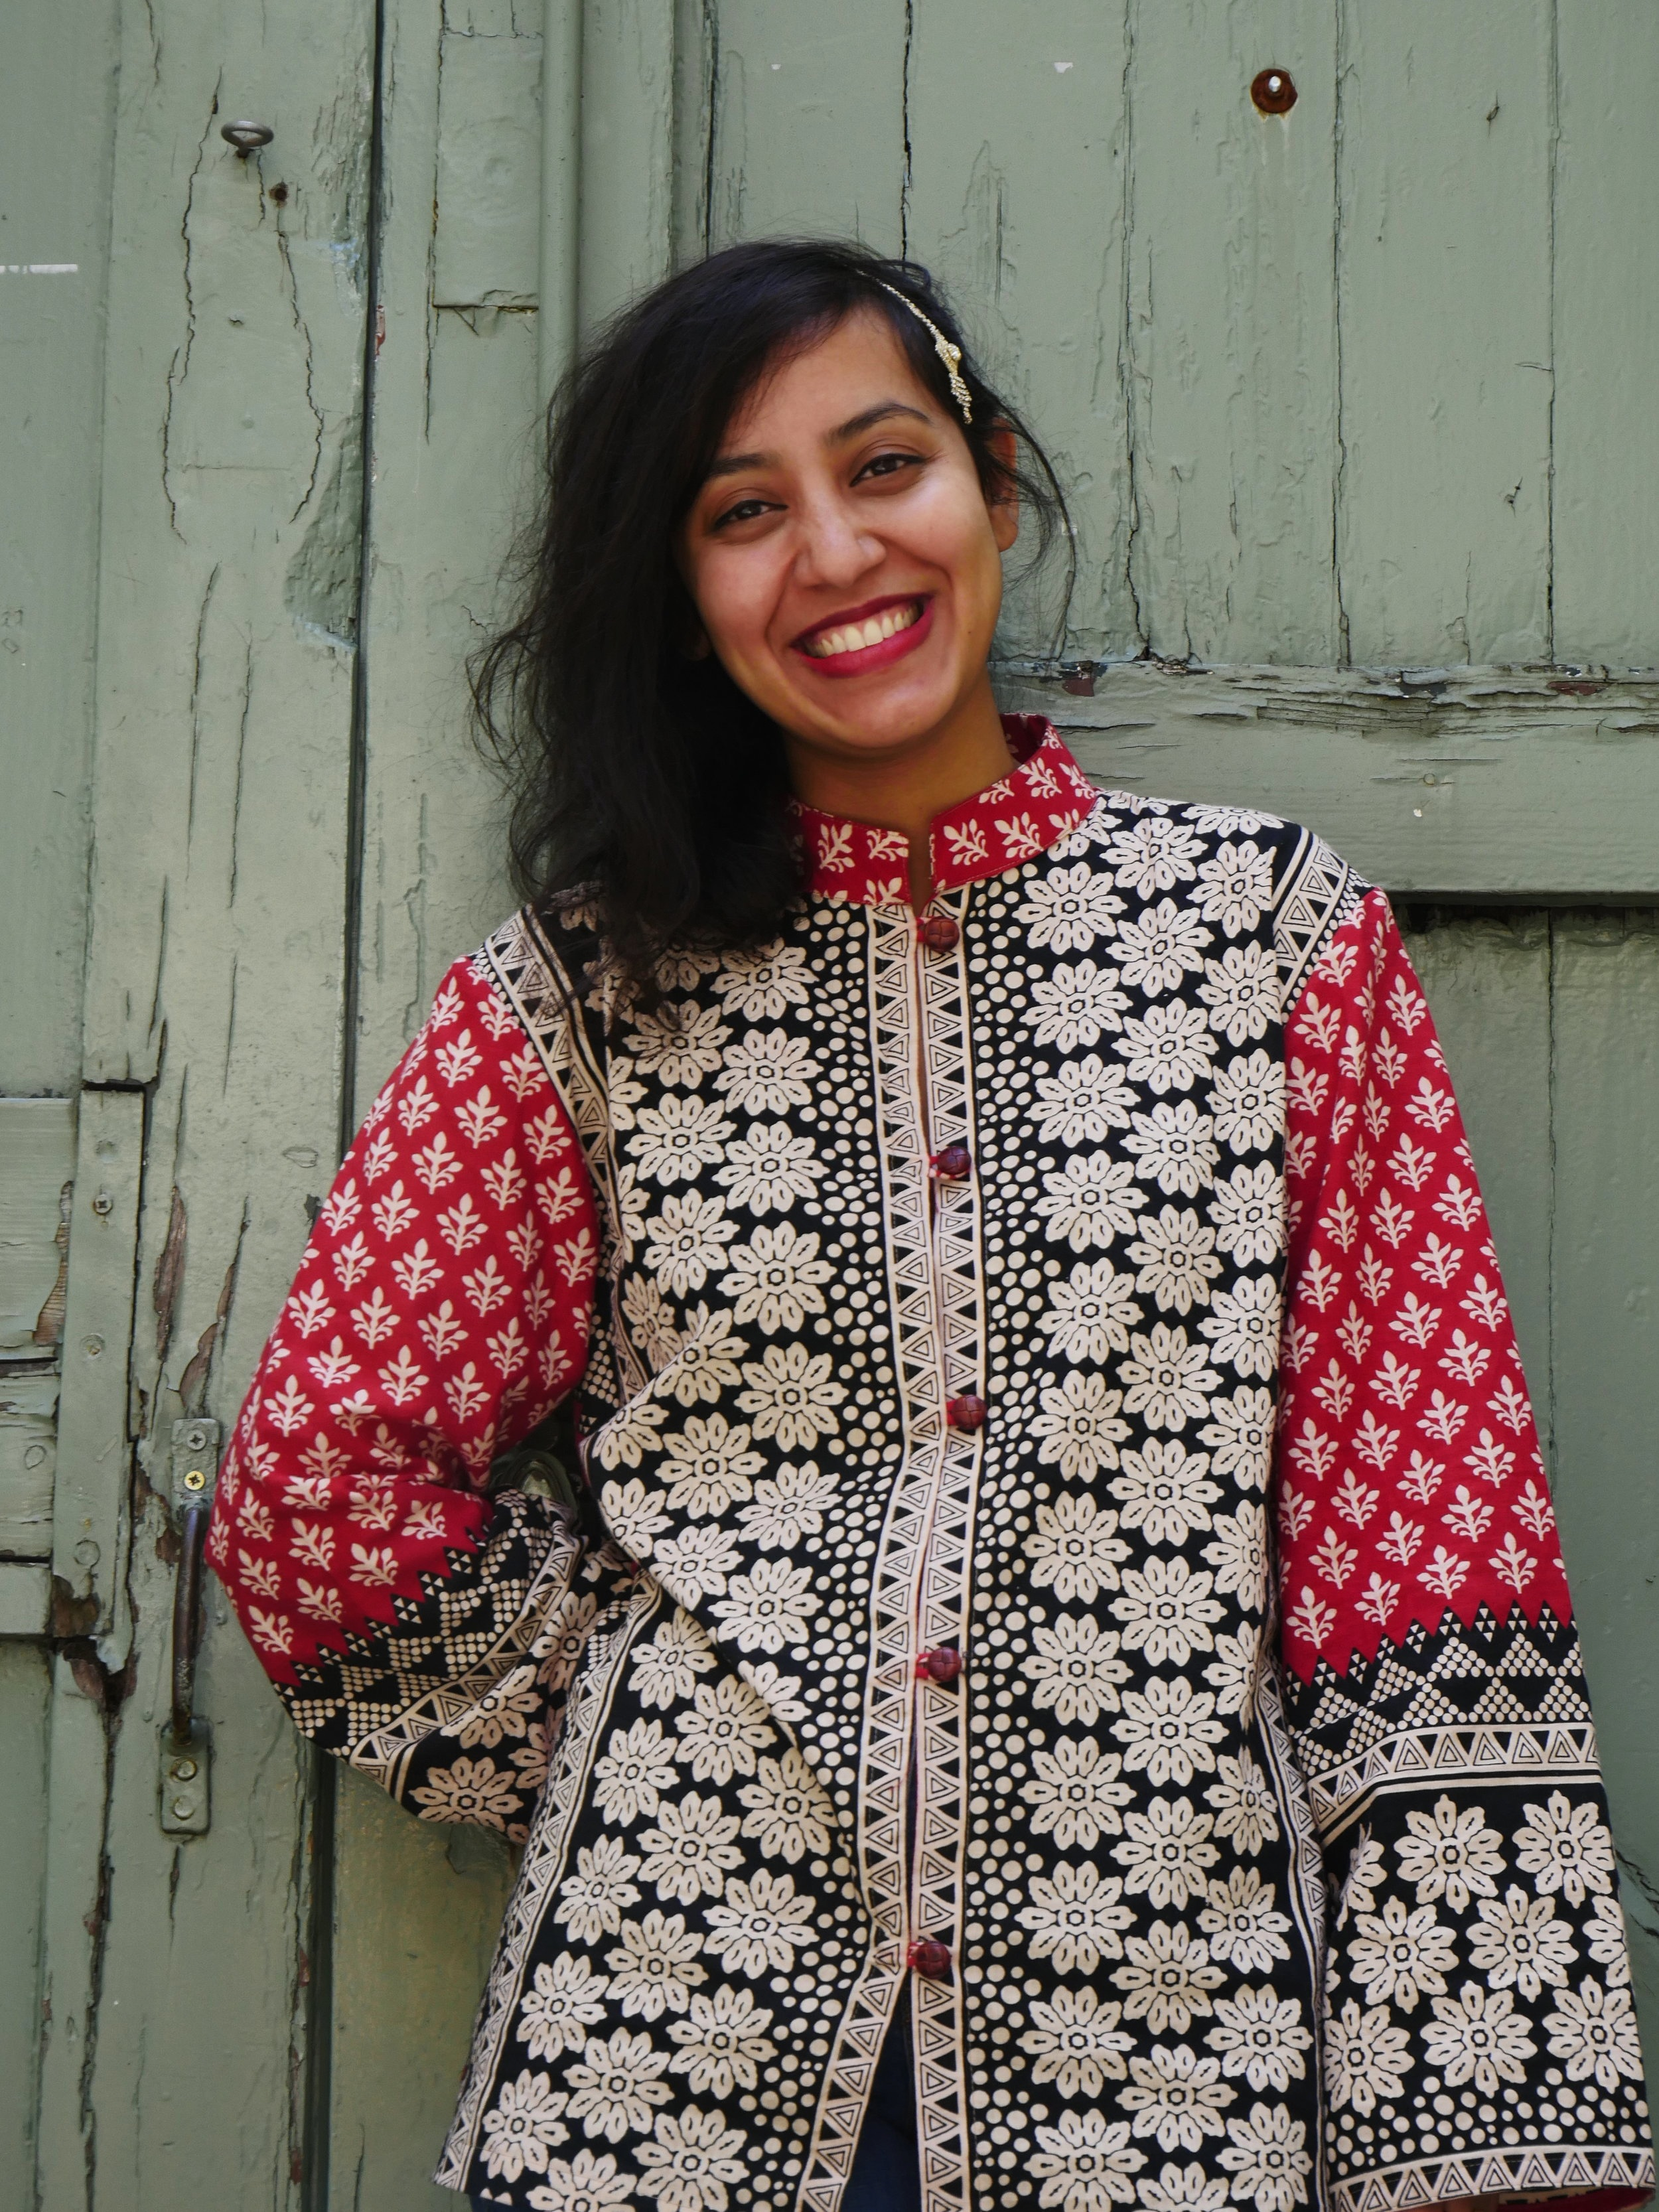 MELISSA RED KASHMIRI KIMONO - 100% Indian Cotton, made in Bangladesh with love